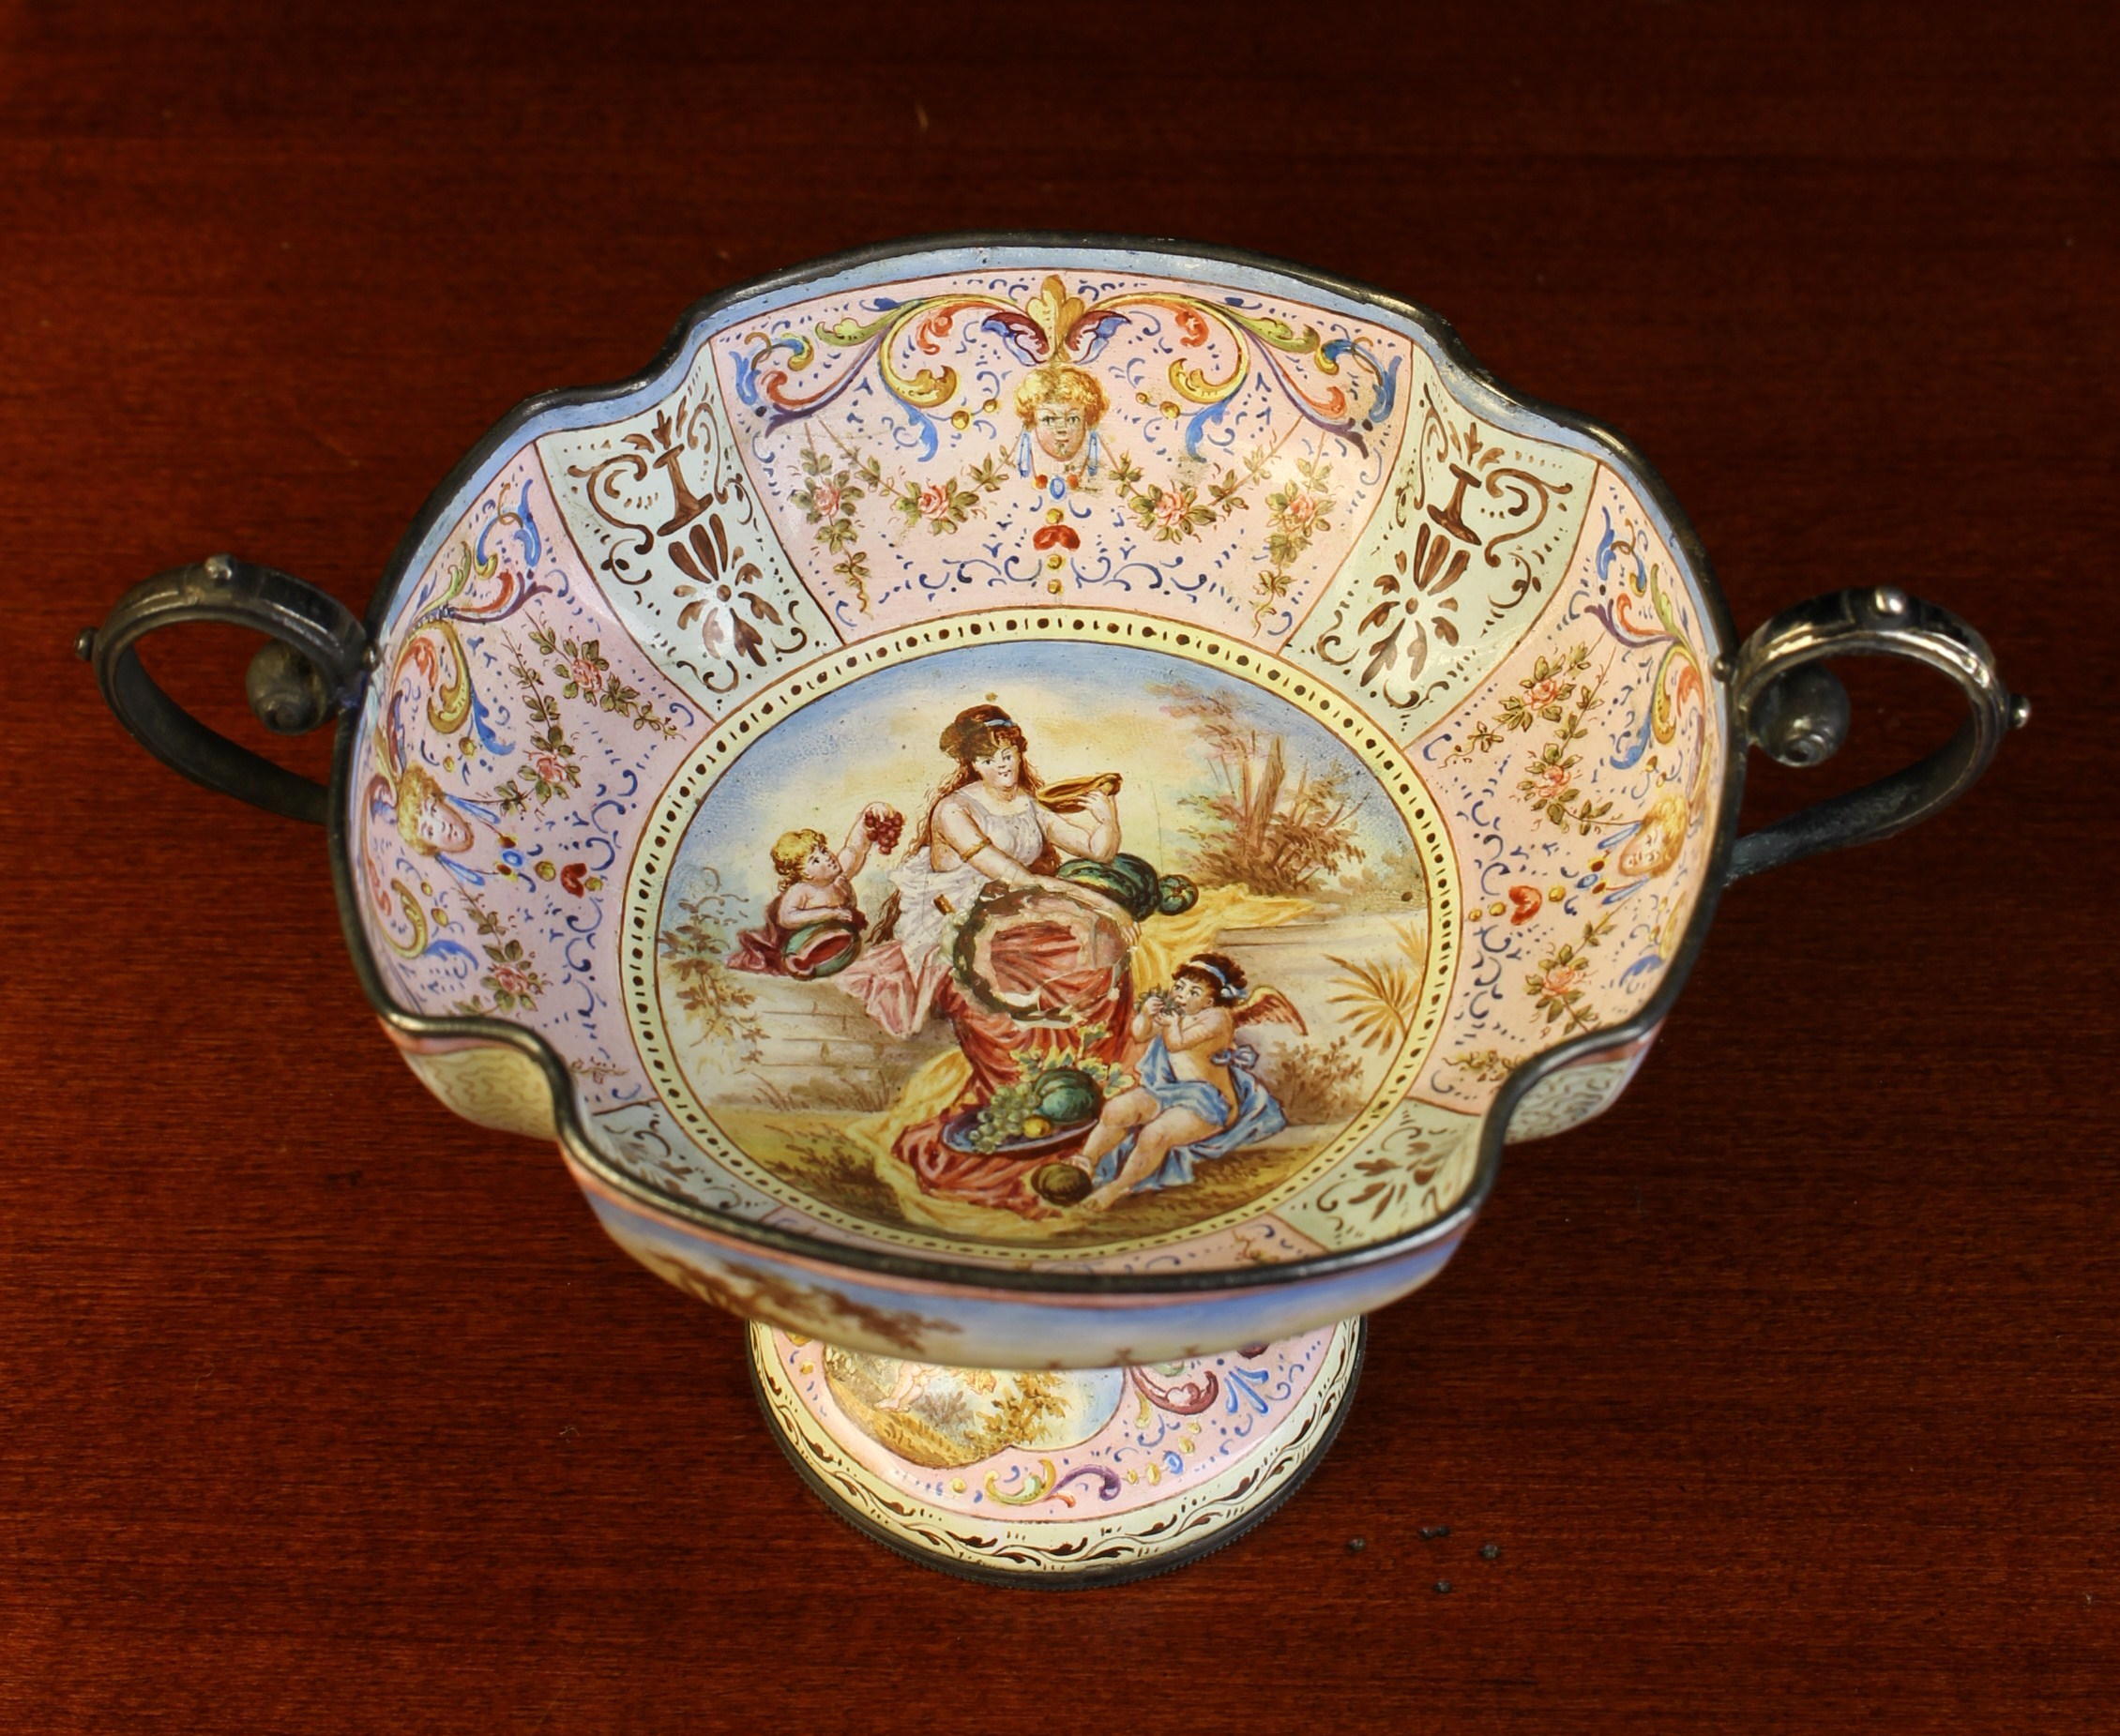 A 19th Century Vienna Enamel Miniature Comport.